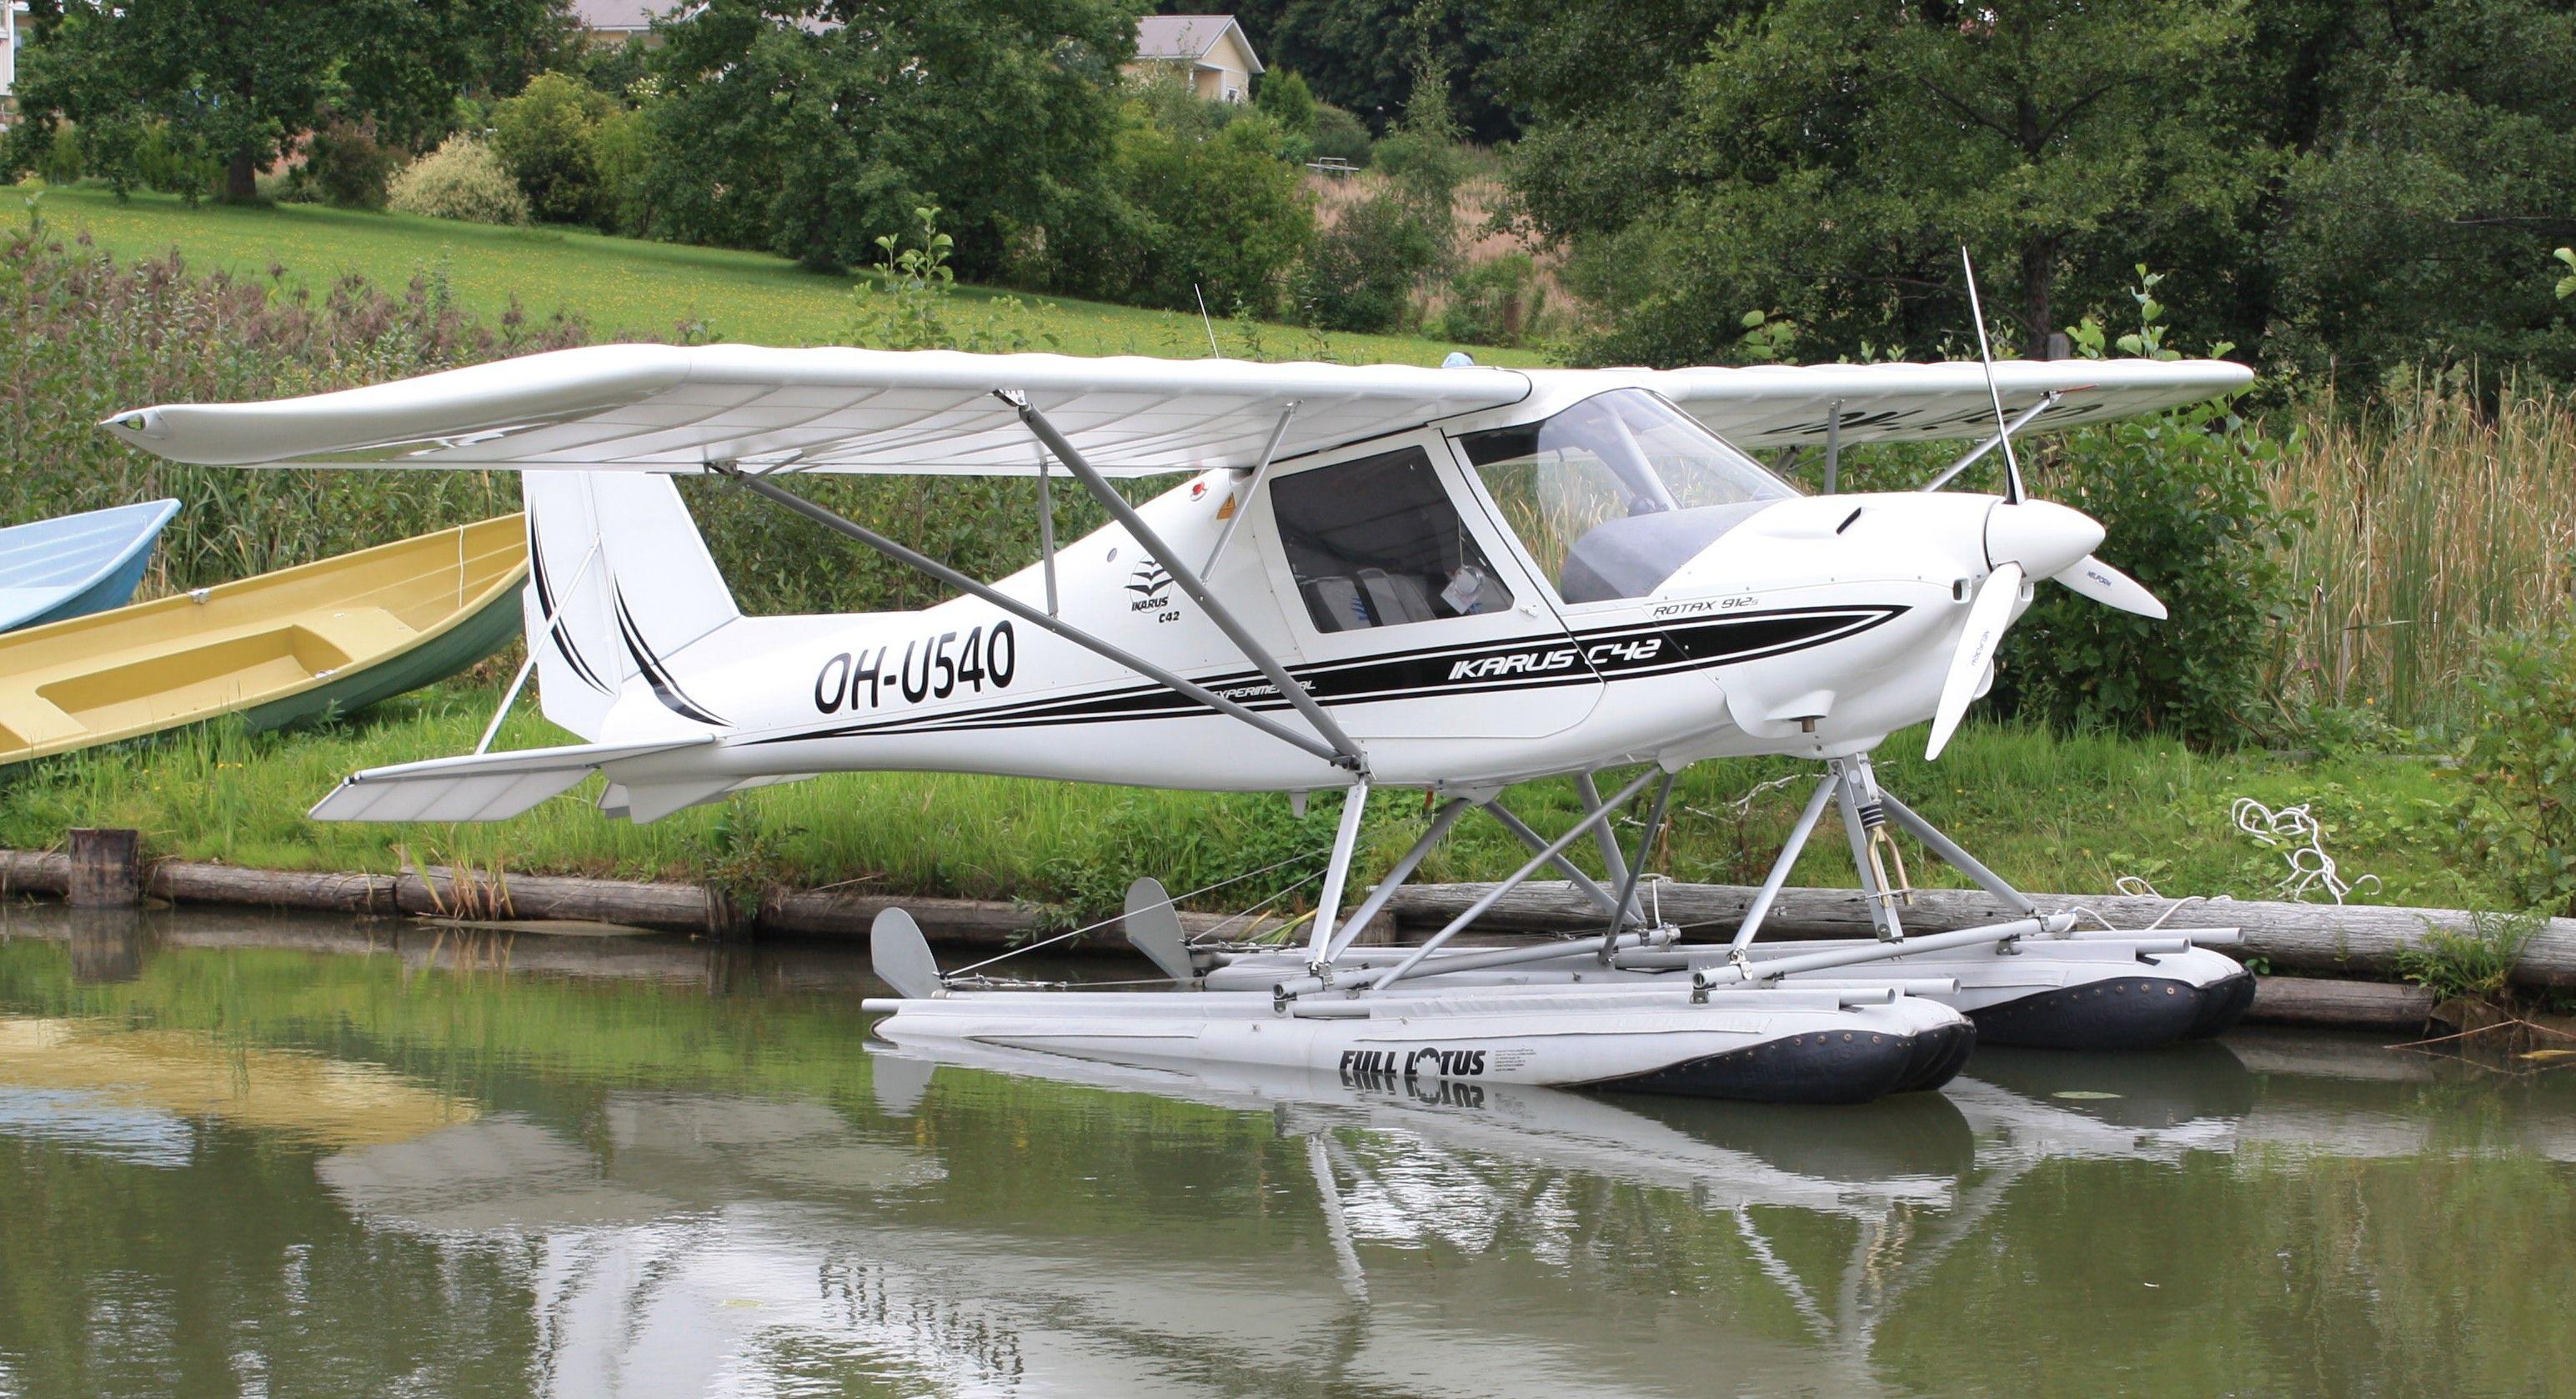 Ikarus C42 Ultraleichtflugzeuge Aircraft Und Microlight Aircraft